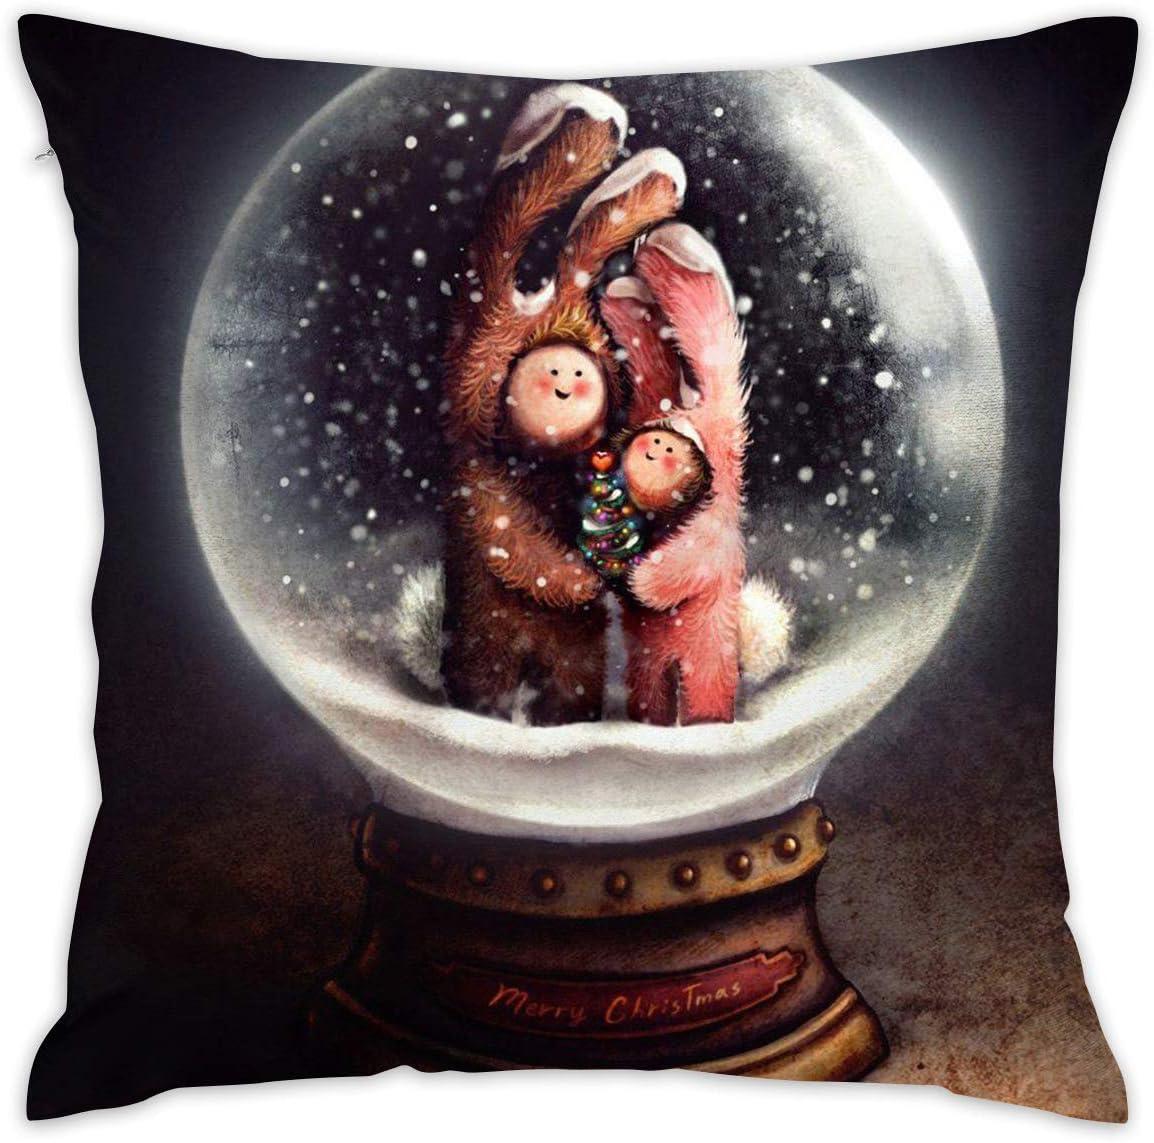 Amazon Com Markui Throw Pillow Cover Snow Globe Bed Sofa Pillow Case Sleeping Pillow Soft Cushion 18 X 18 Home Kitchen